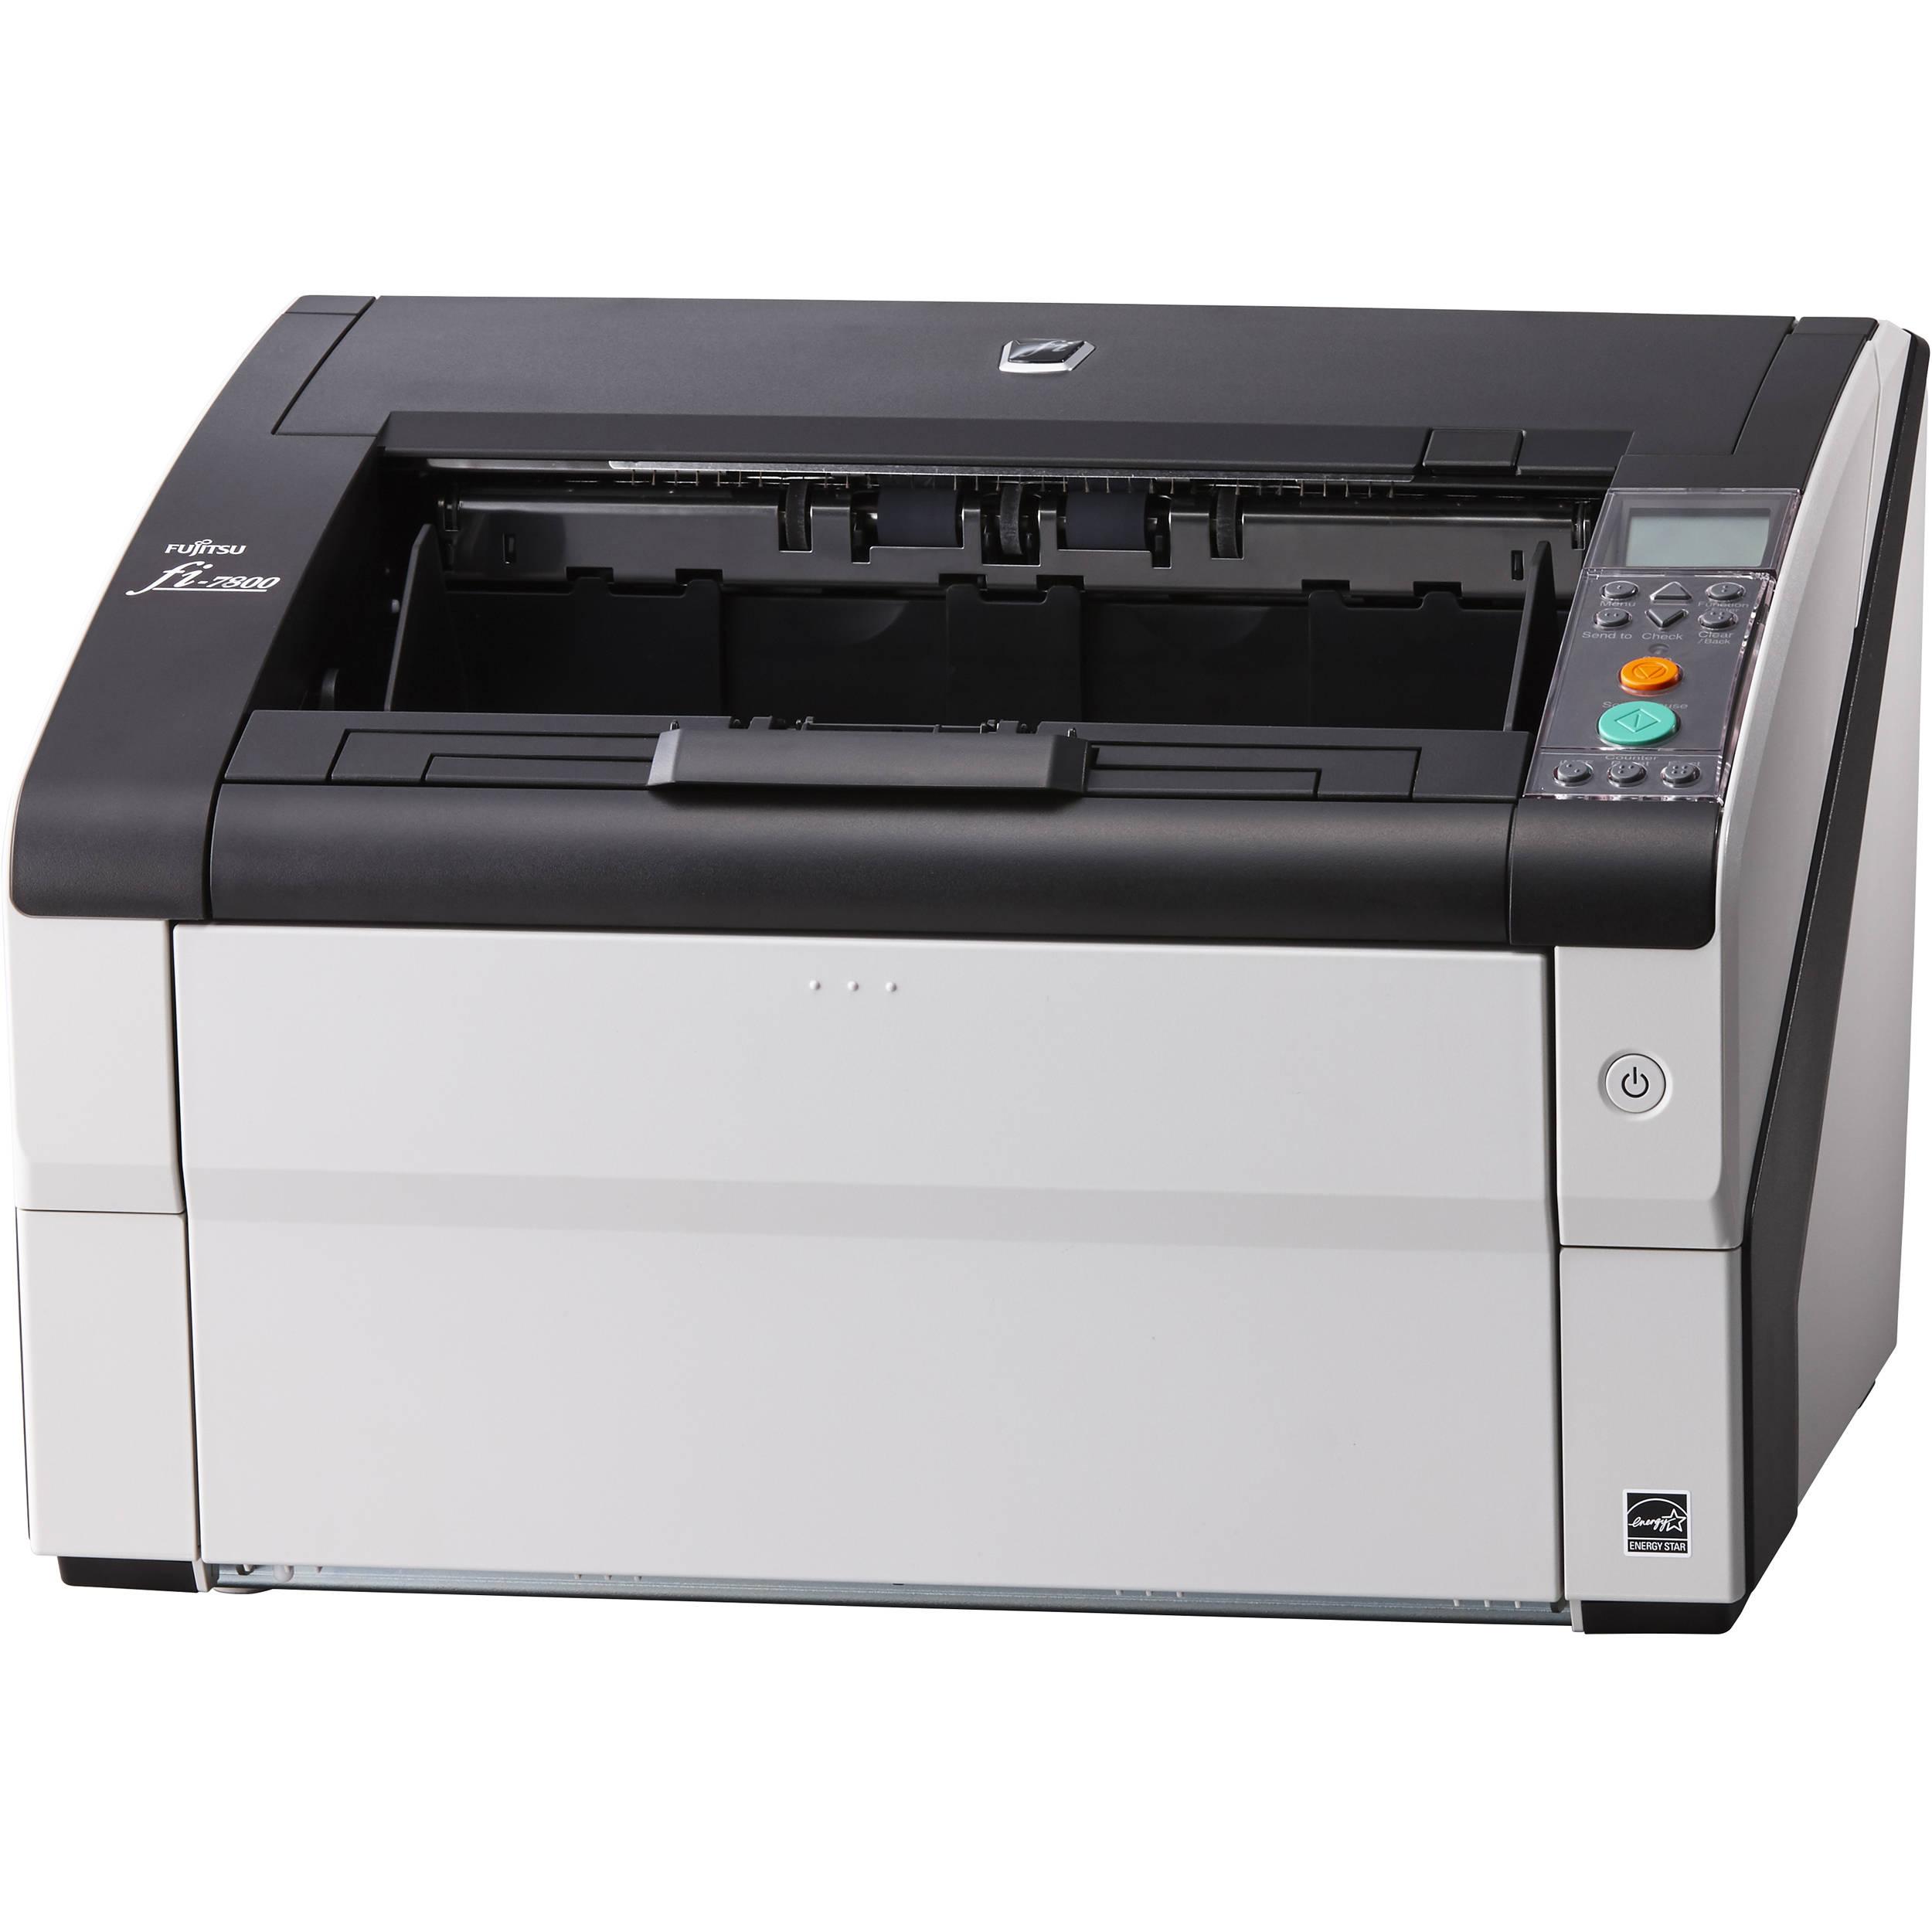 Foto Produto Scanner Fujitsu Fi-7800, 110ppm, Duplex (Frente e Verso)